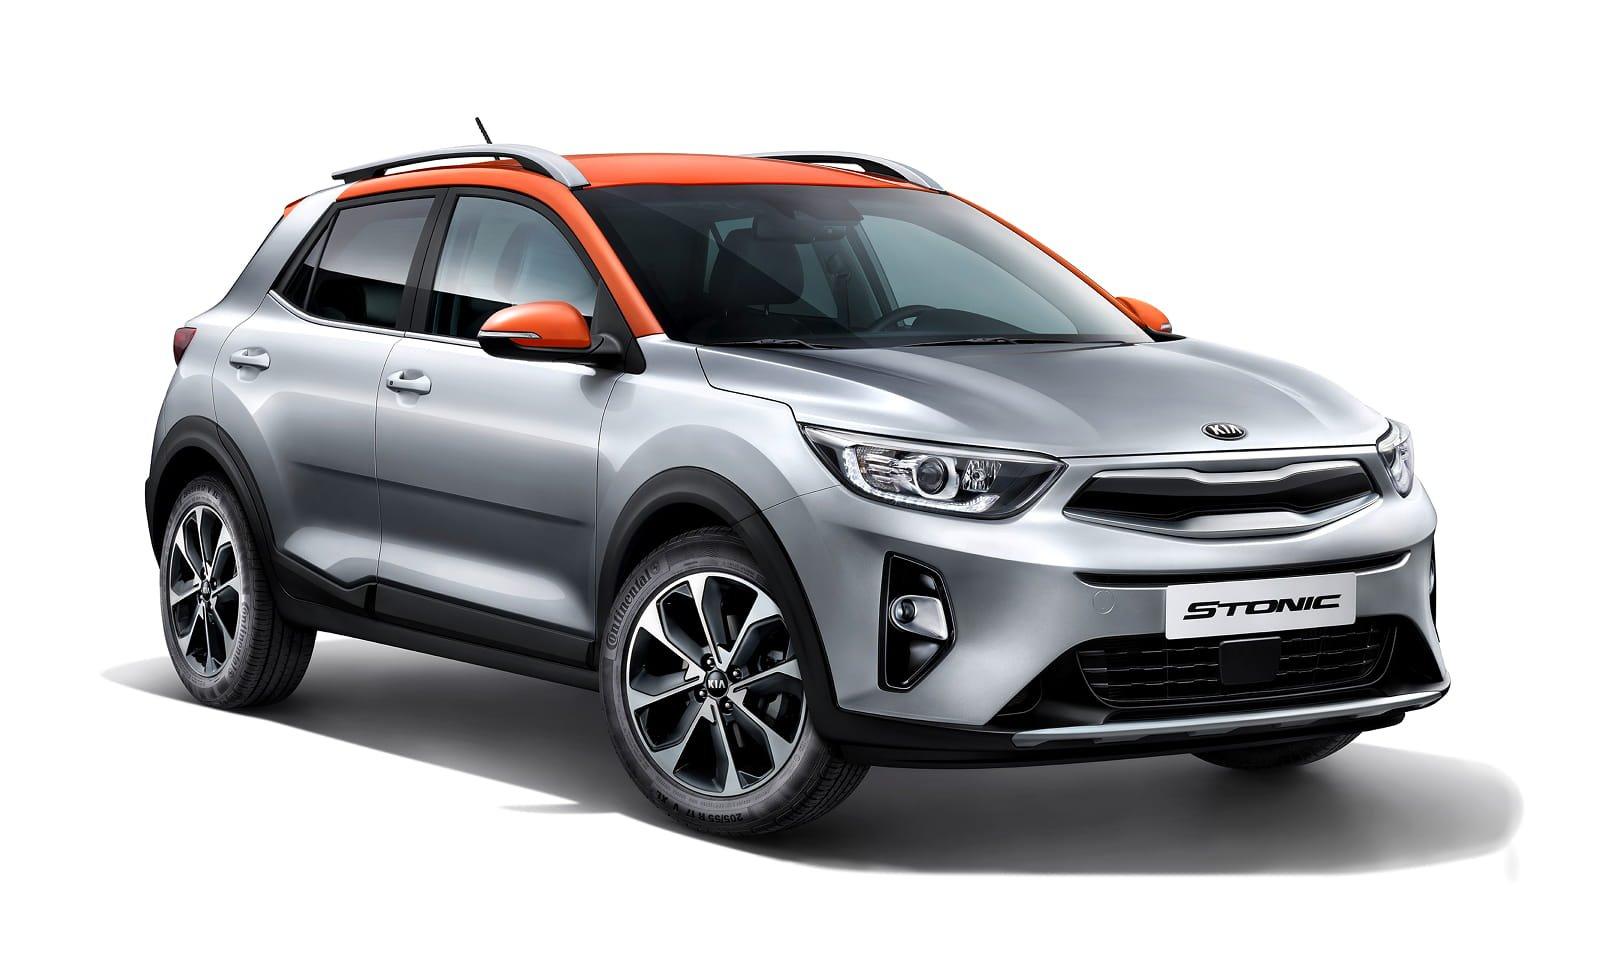 B-SUV gemelli diversi: Kia Stonic vs Hyundai Kona